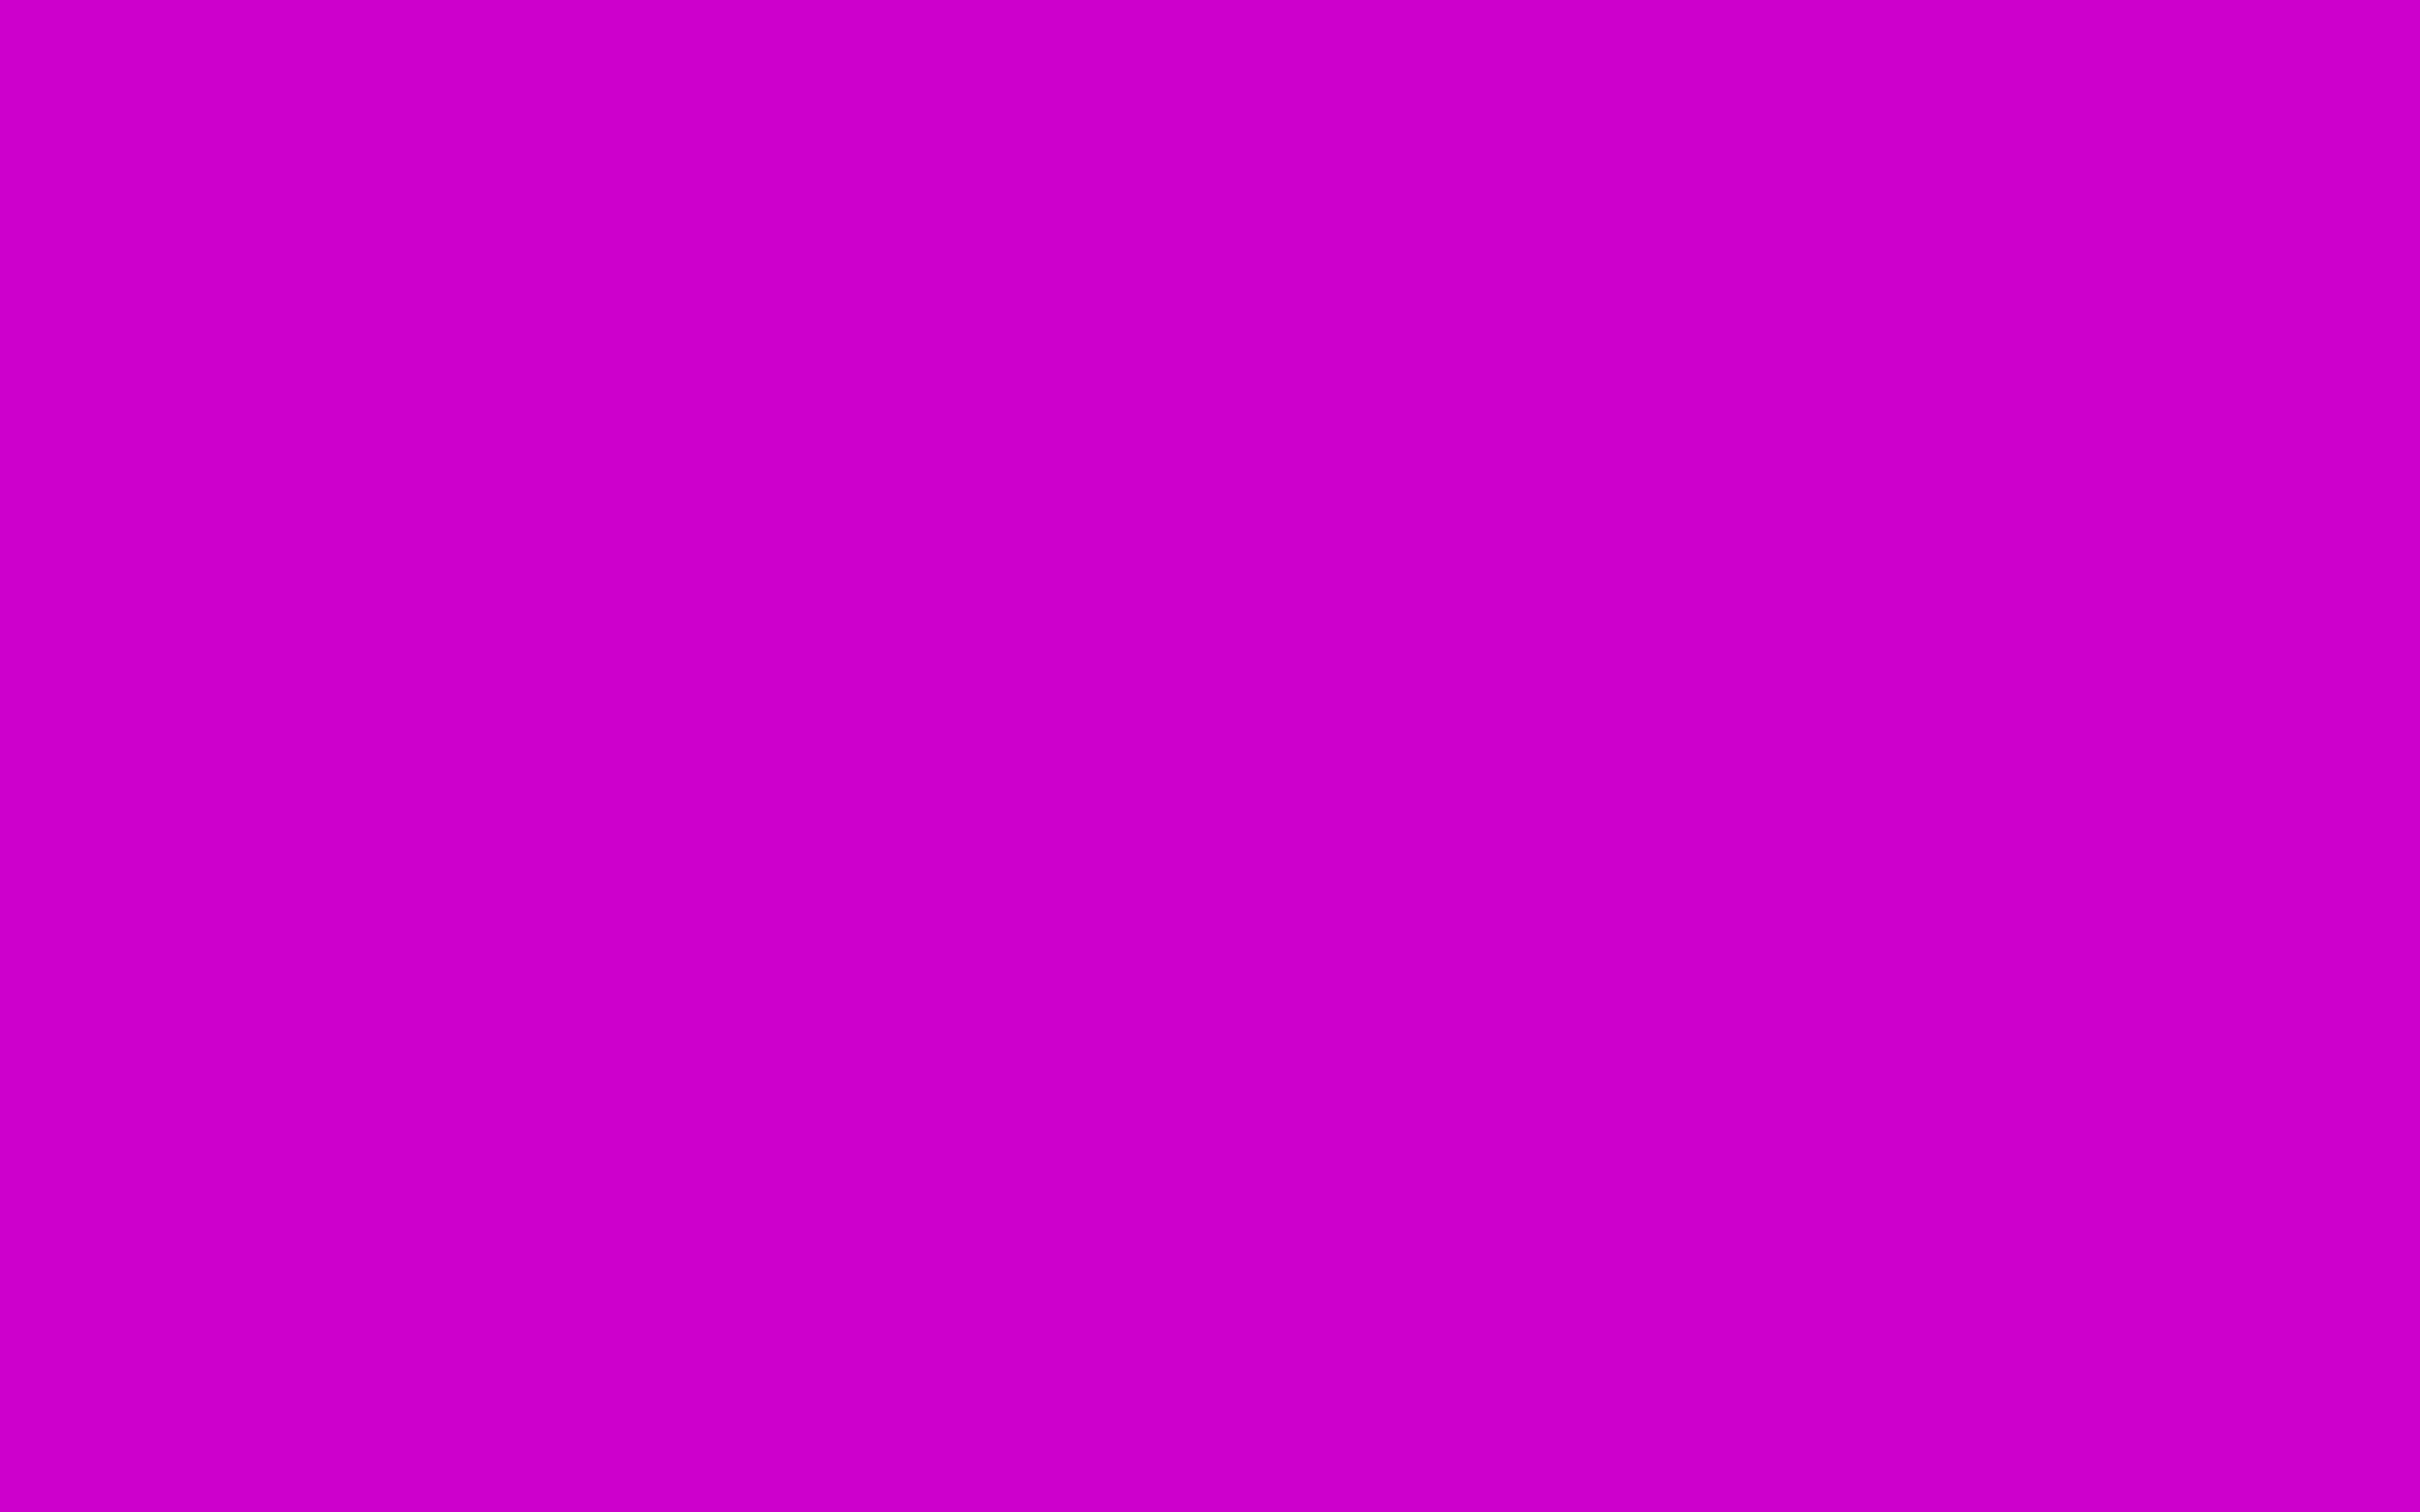 2560x1600 Deep Magenta Solid Color Background